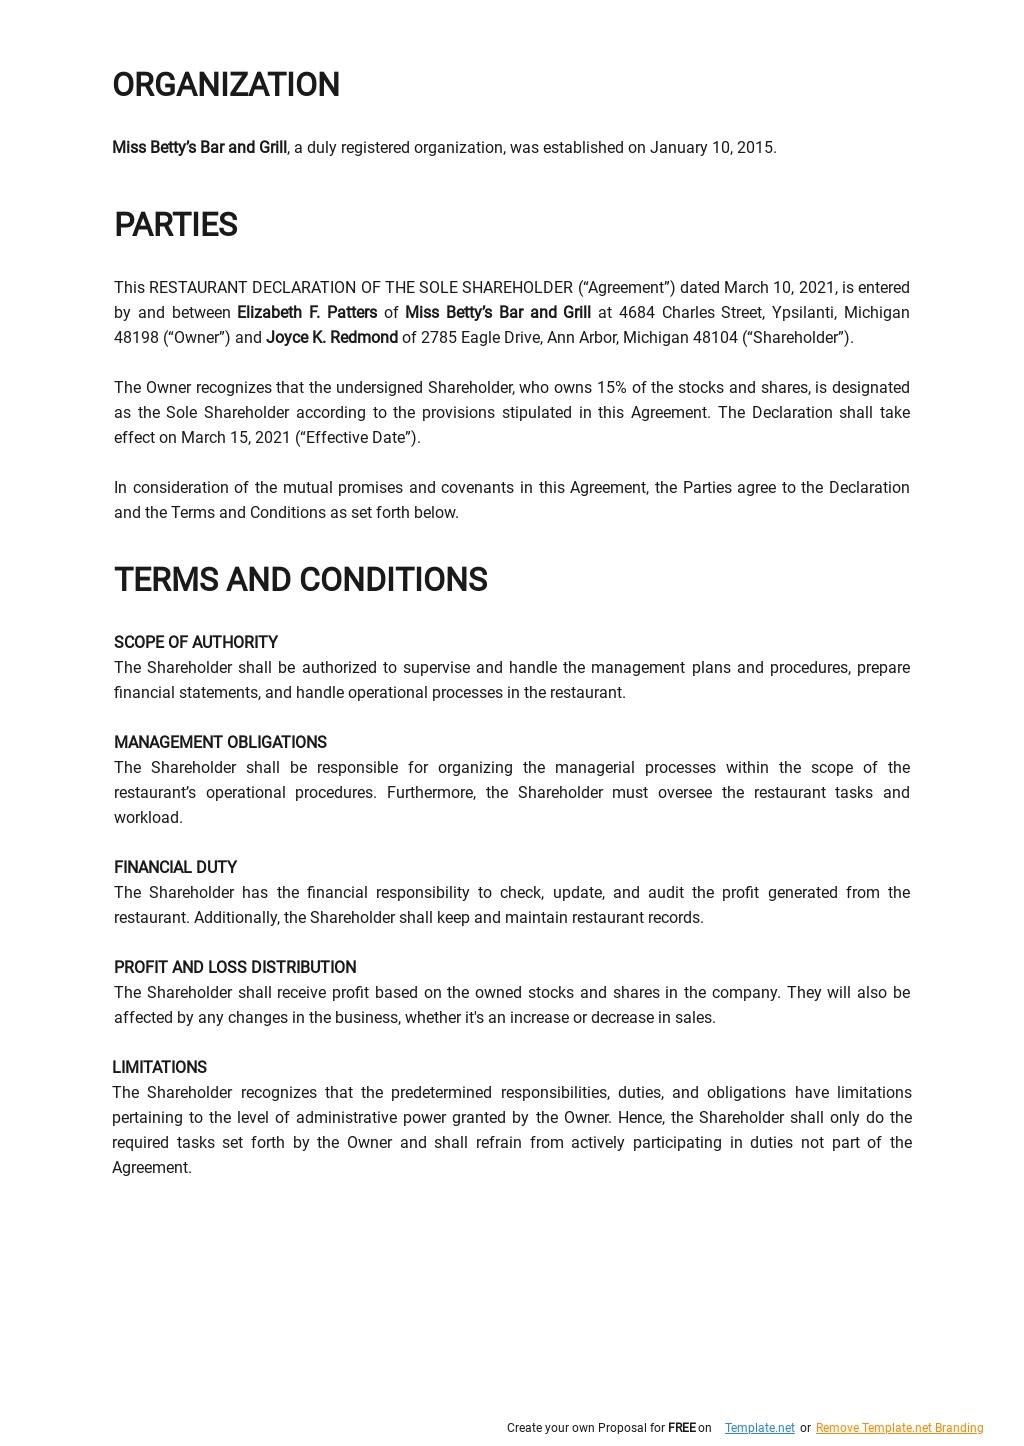 Restaurant Declaration of the Sole Shareholder Template 1.jpe